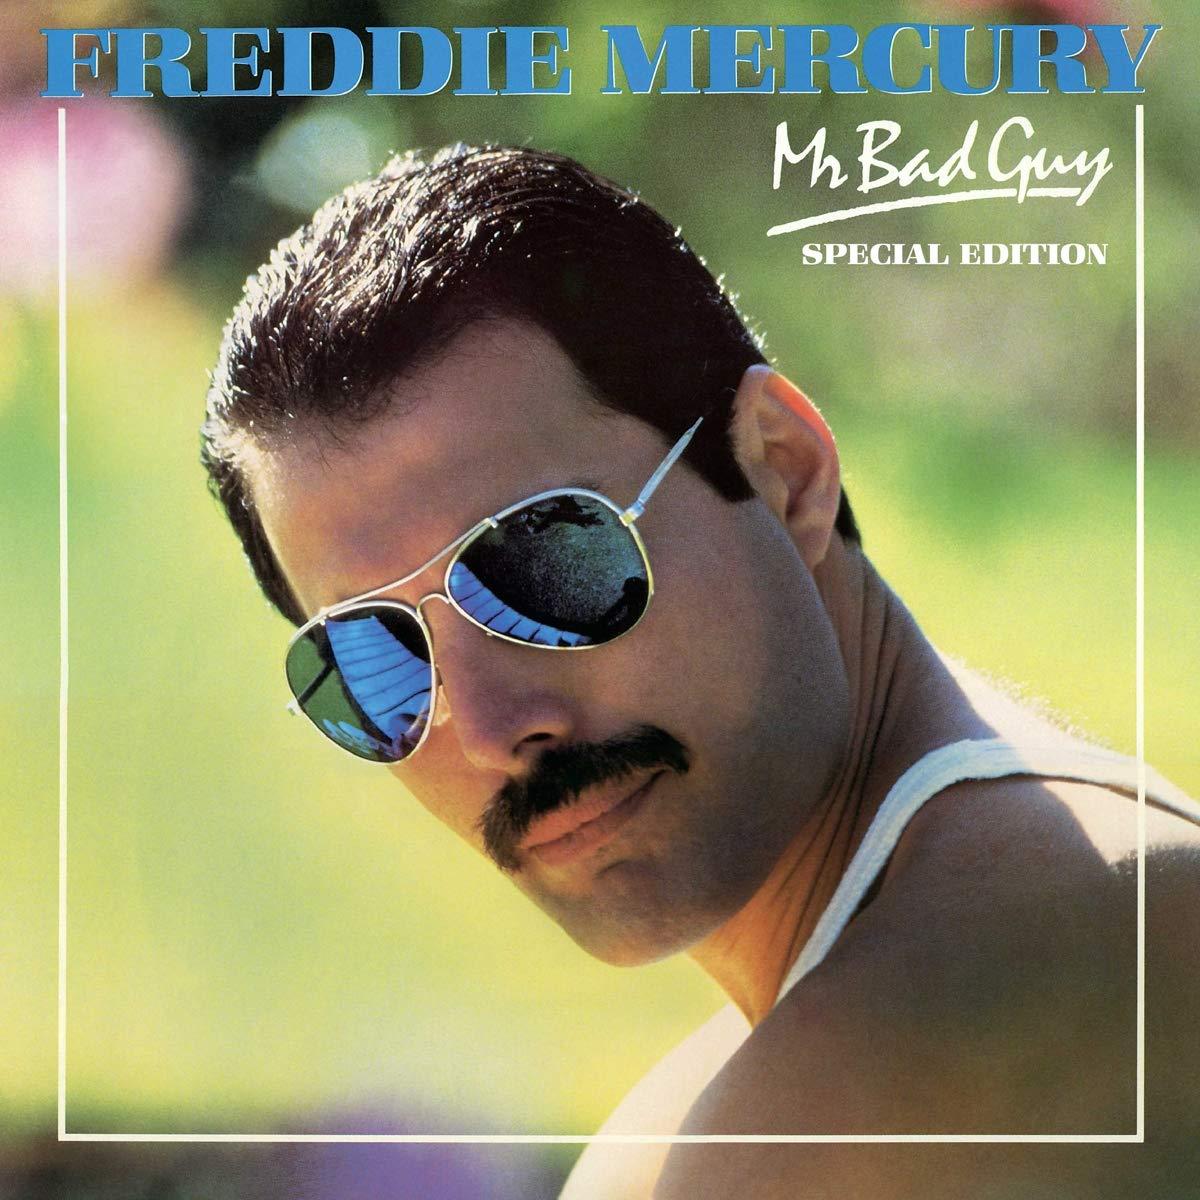 freddie mercury mr bad guy 1985